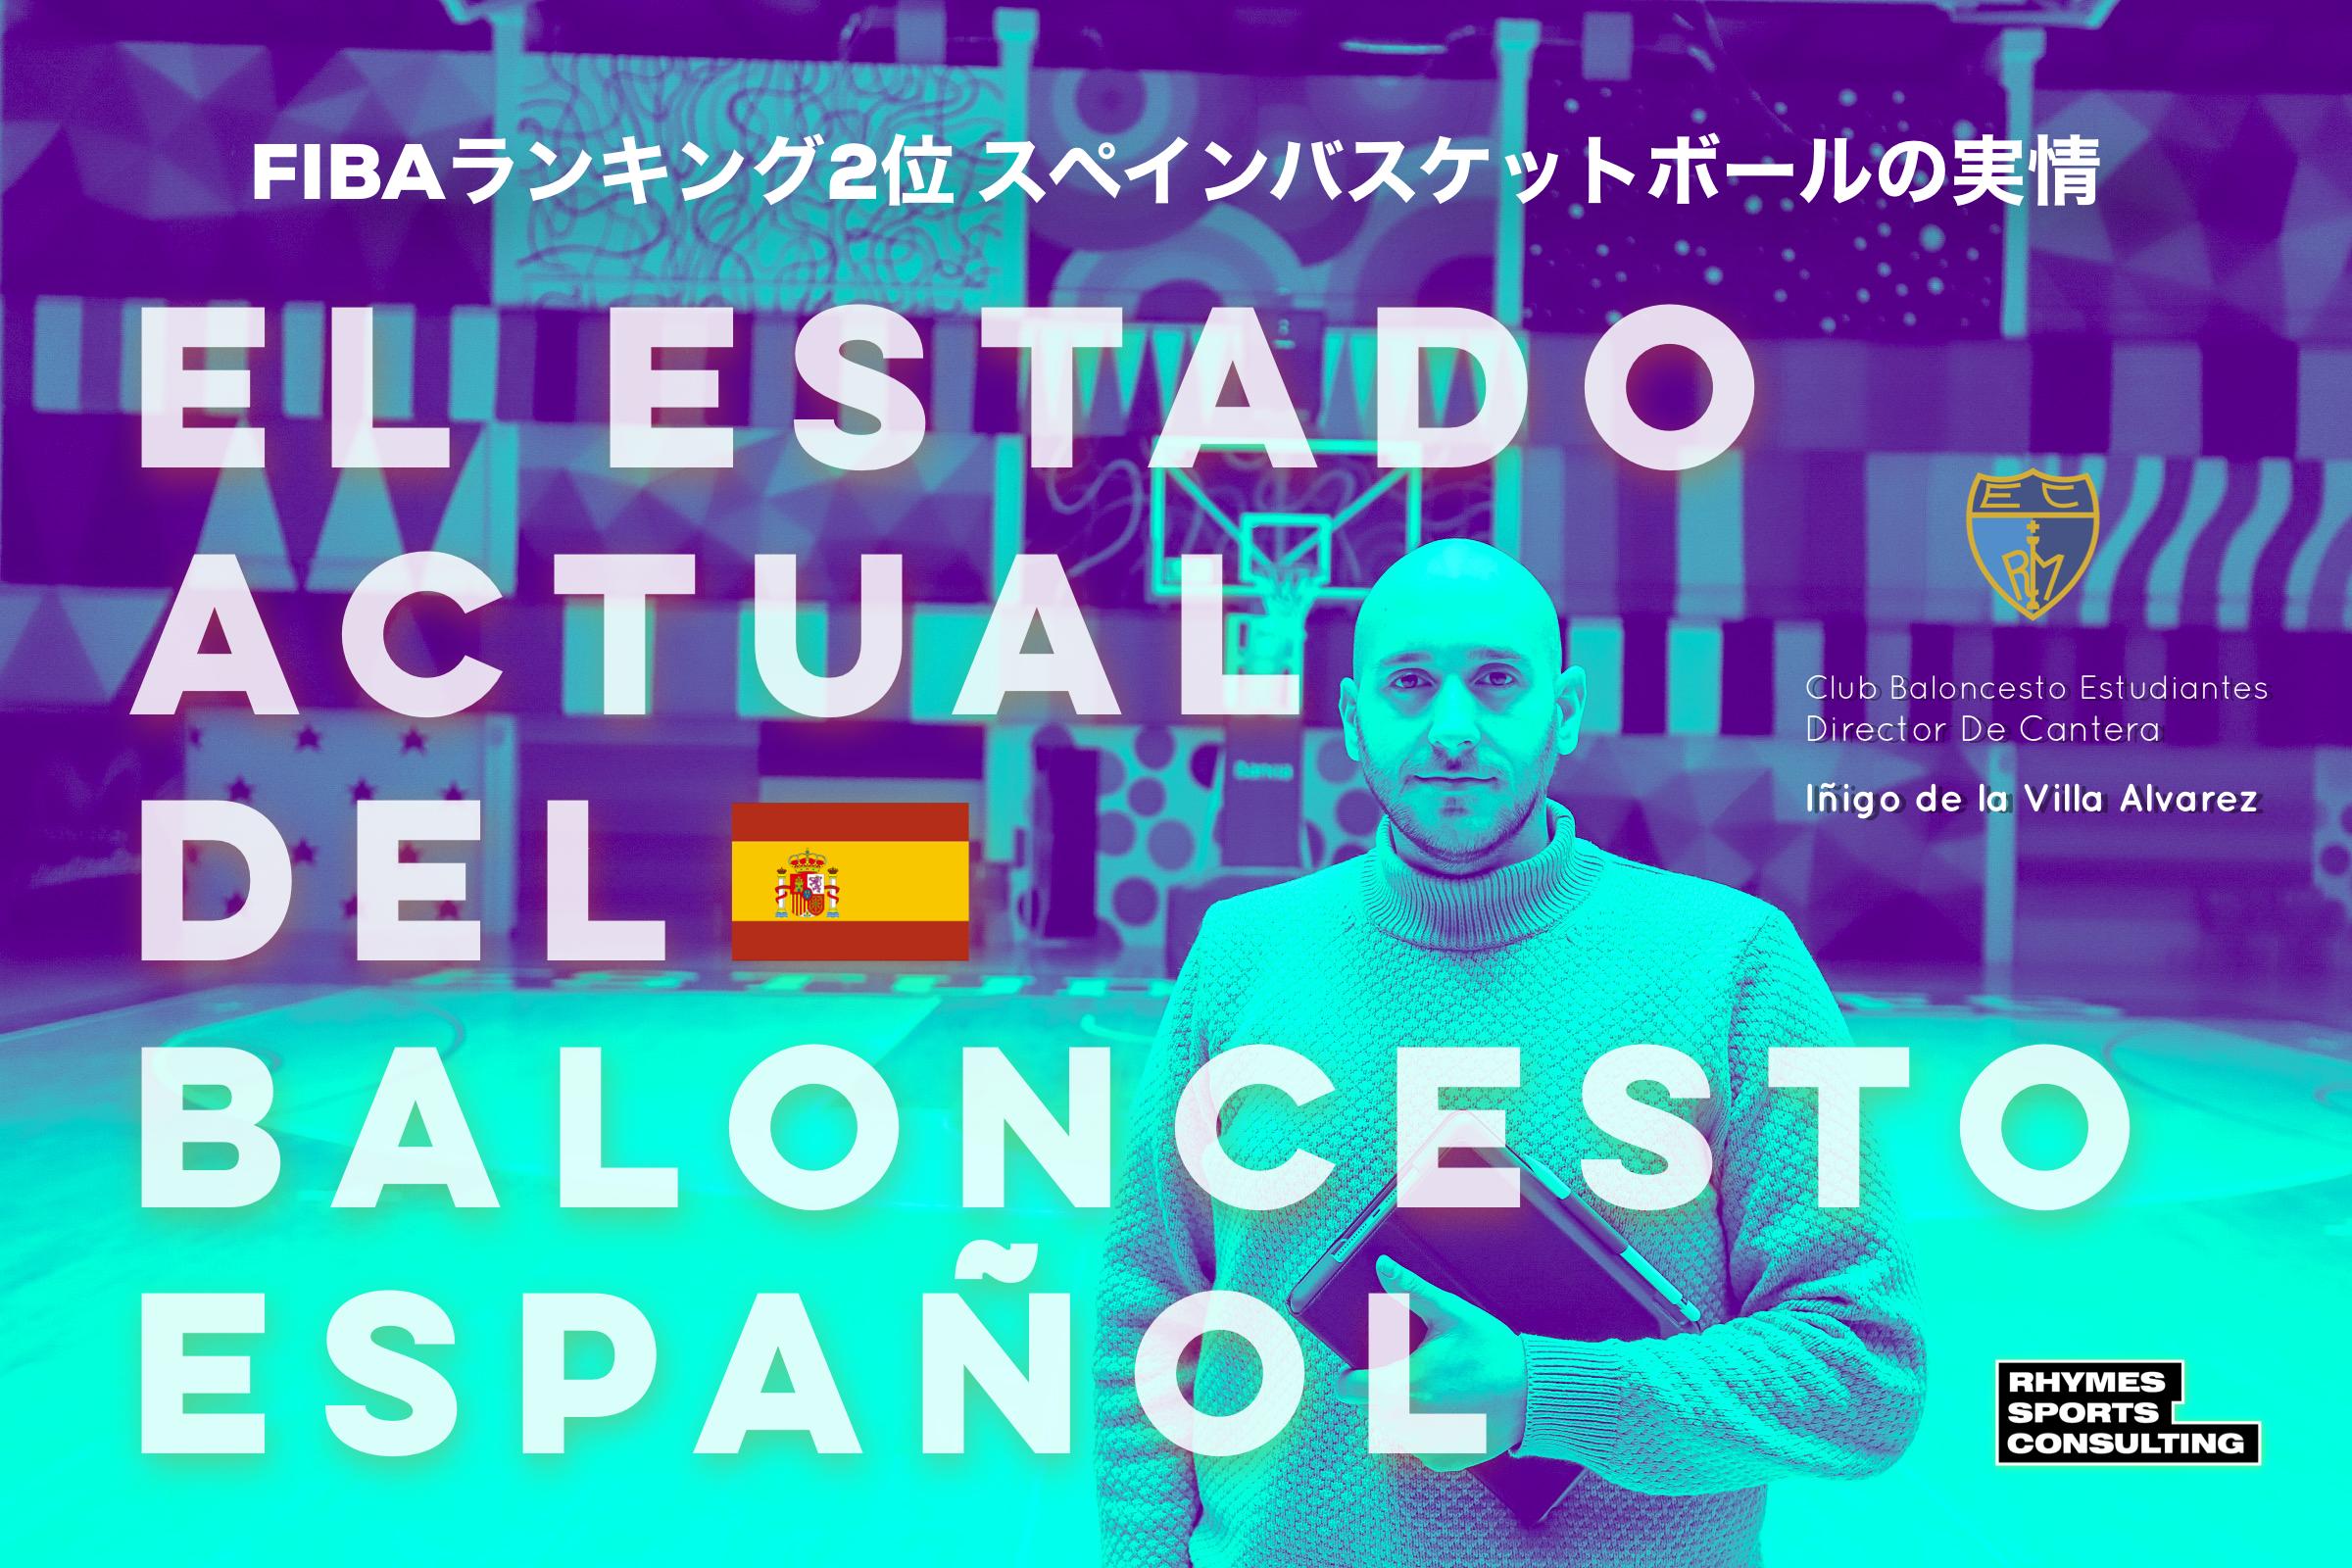 FIBAランキング2位 スペインバスケットボールの実情|ライムズ株式会社 SHOEHURRY!